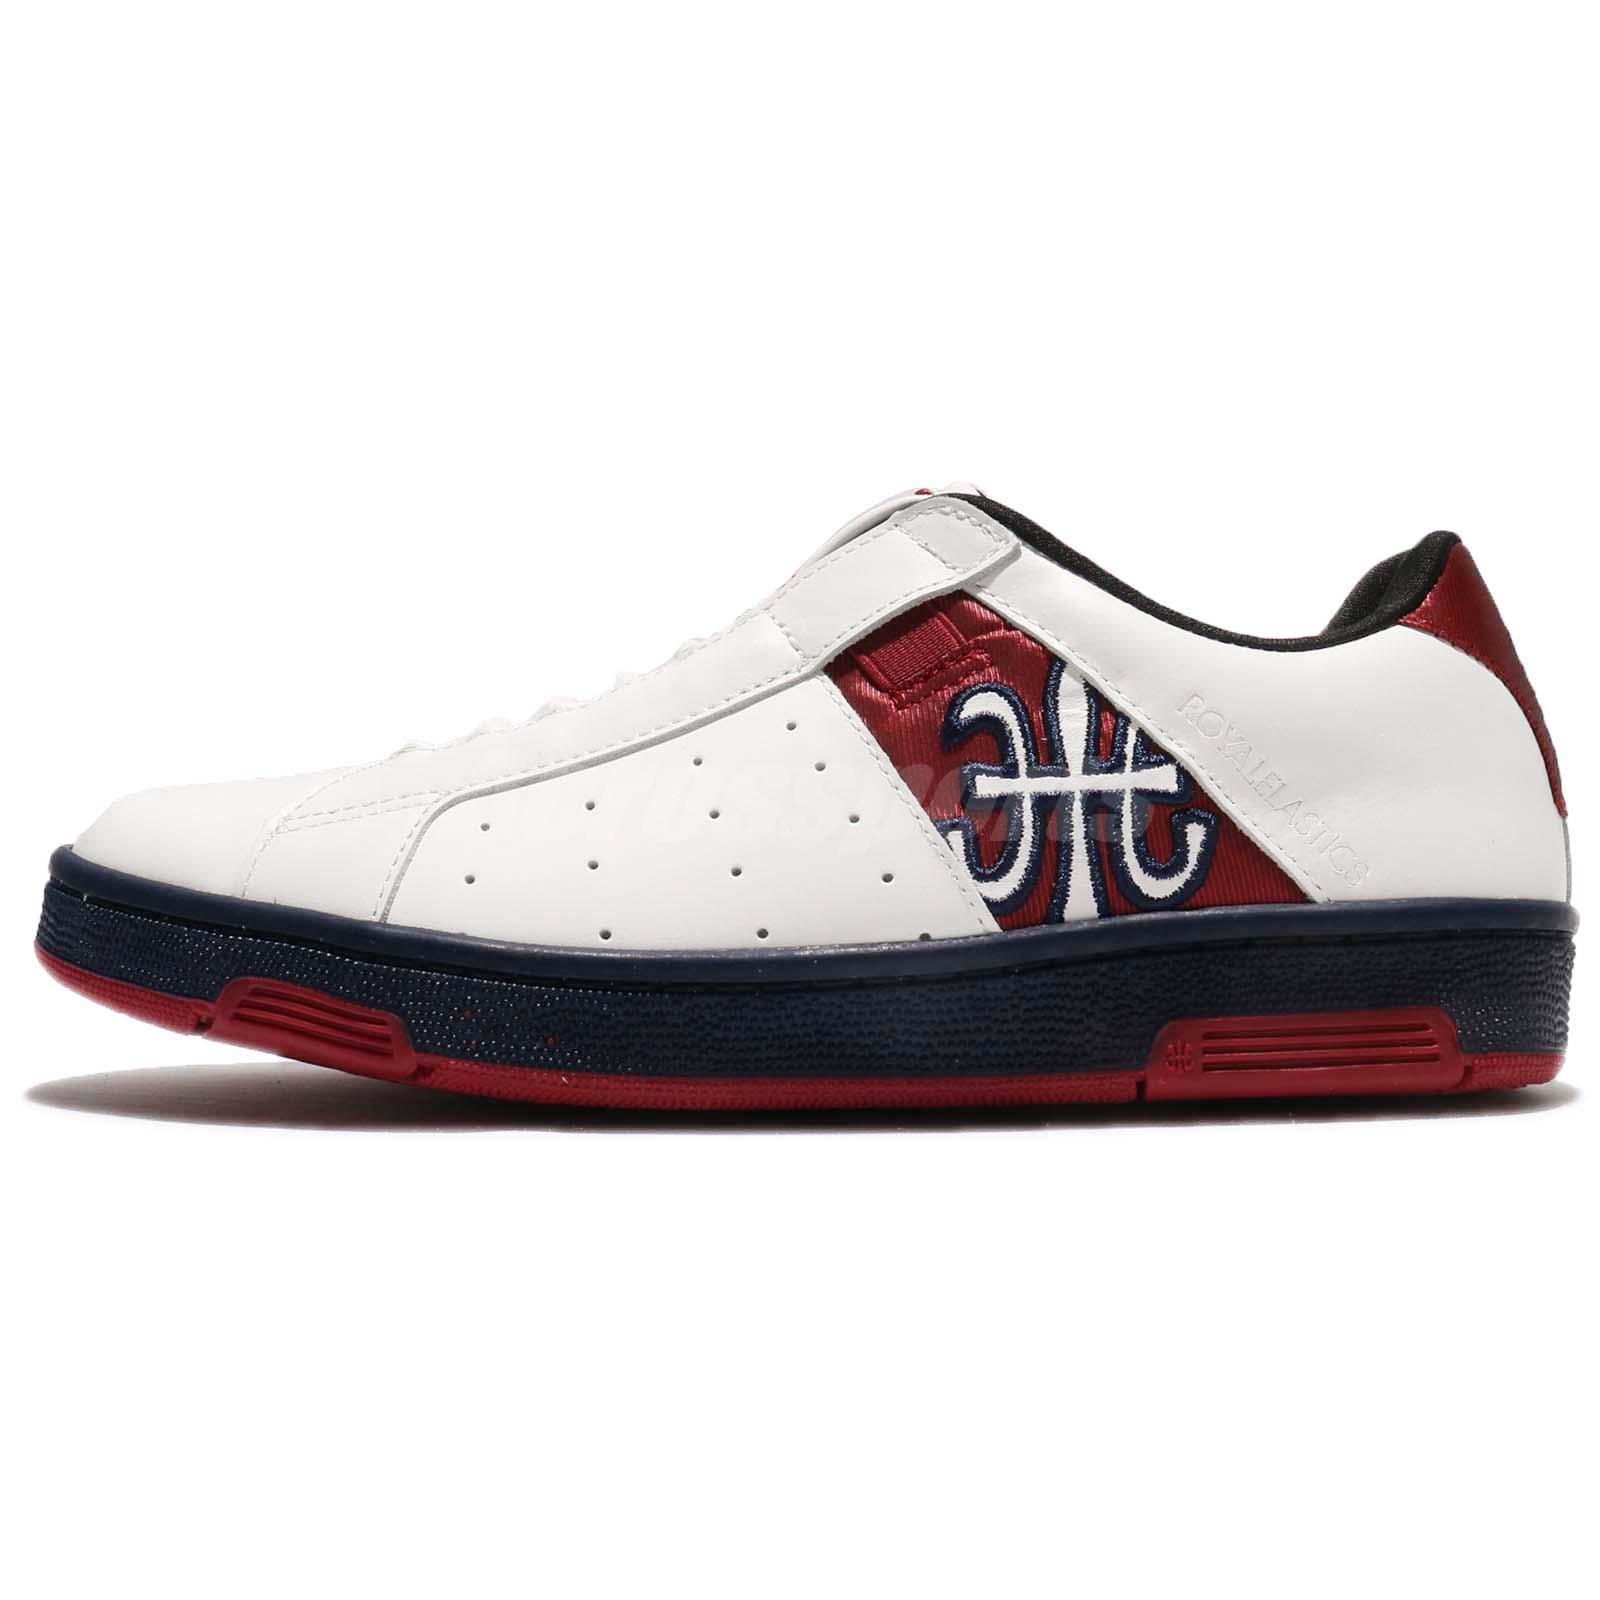 Royal Elastics Icon 1707 White Red Leather Women Shoes Sneaker ...